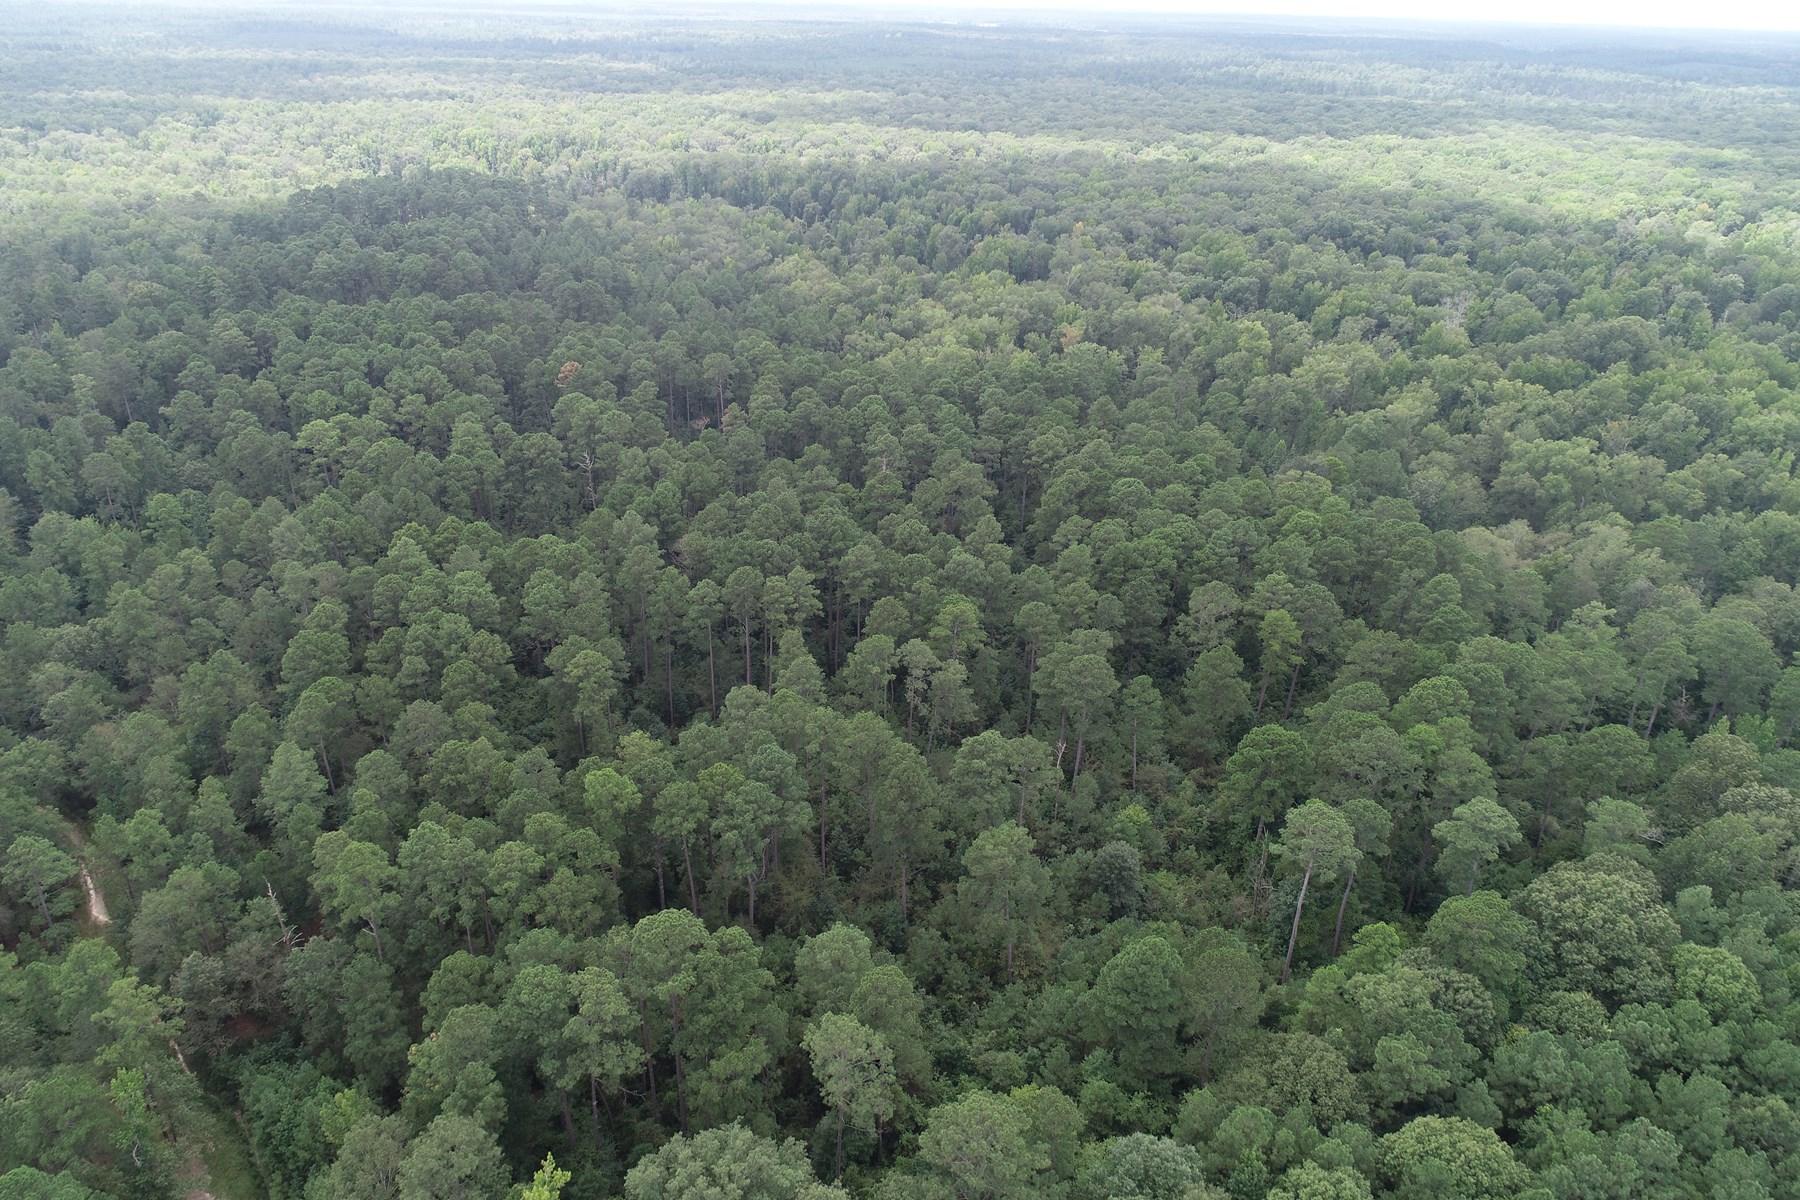 Hardwood-Pine W/ Wetland Habitat in Southern AR For Sale